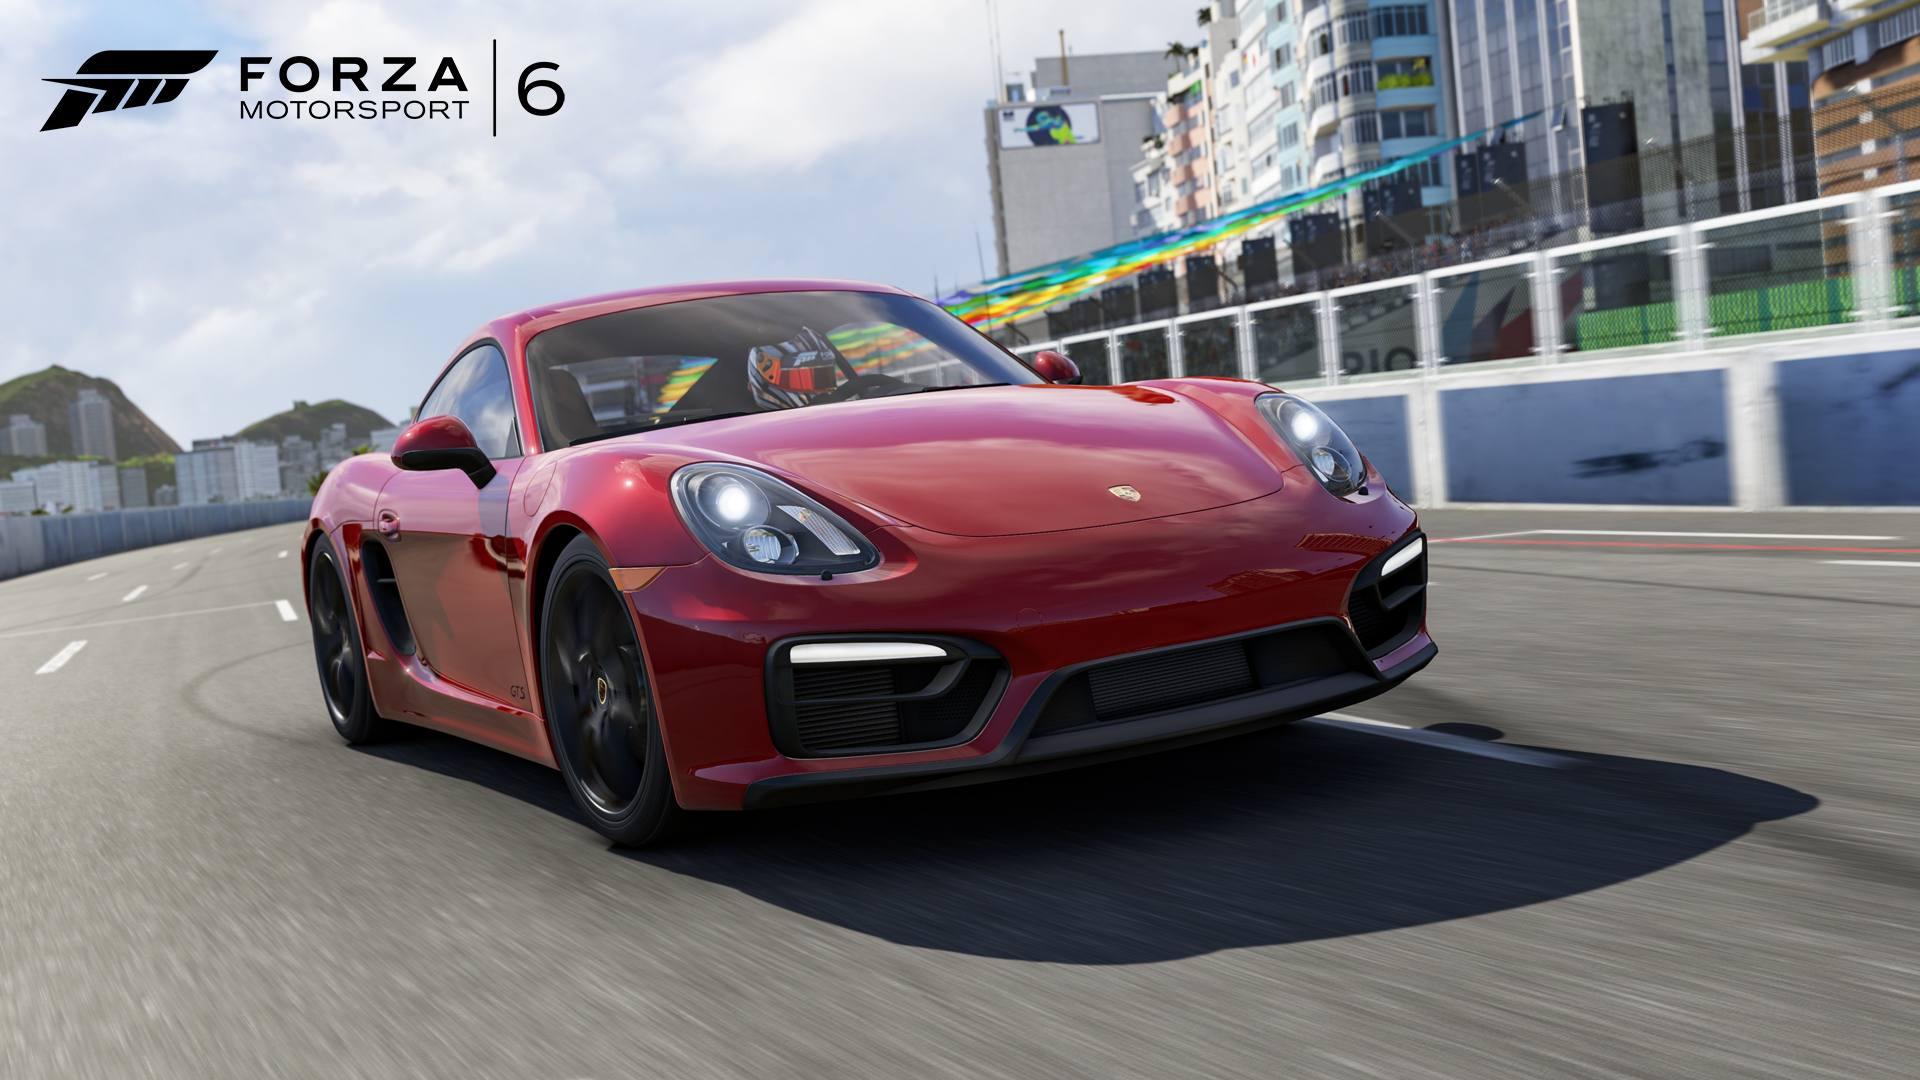 Forza Motorsport 6 01-03-16 2015 Porsche Cayman GTS